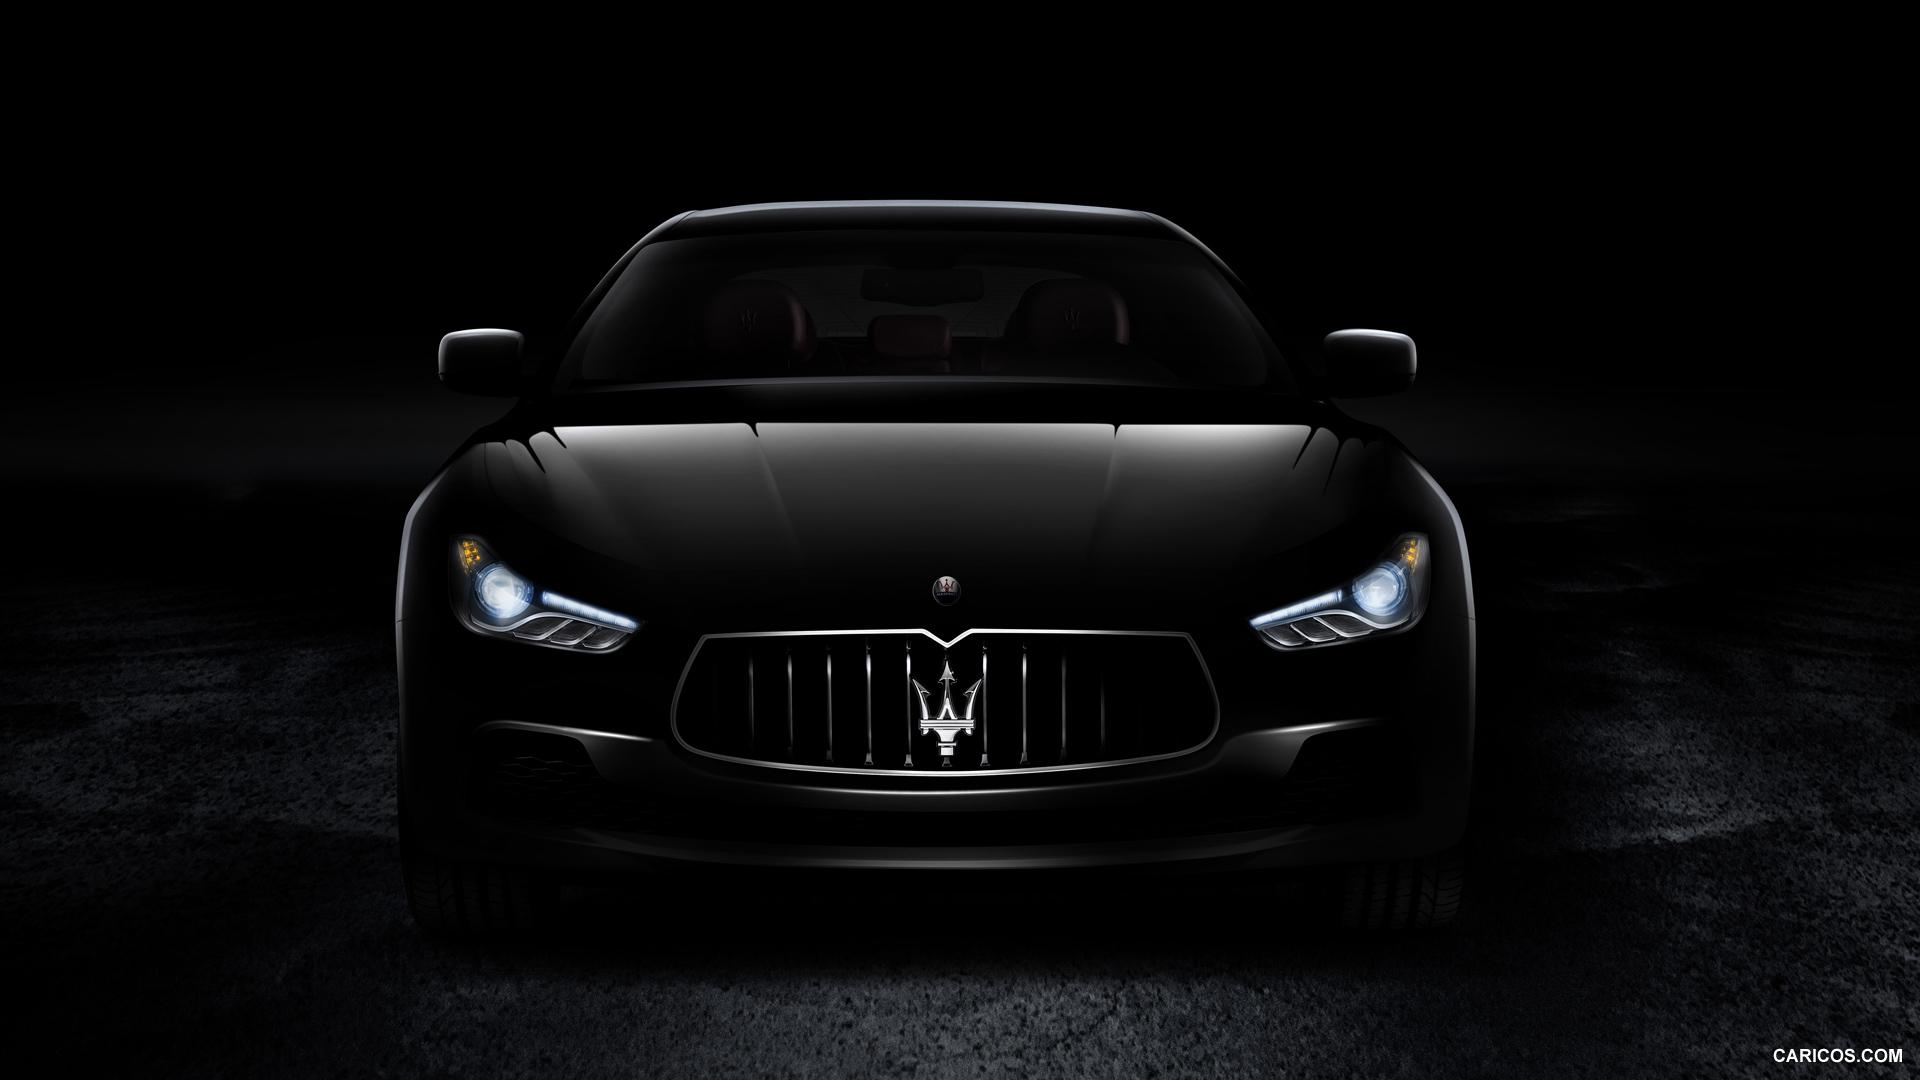 2014 Maserati Ghibli - Front Wallpaper